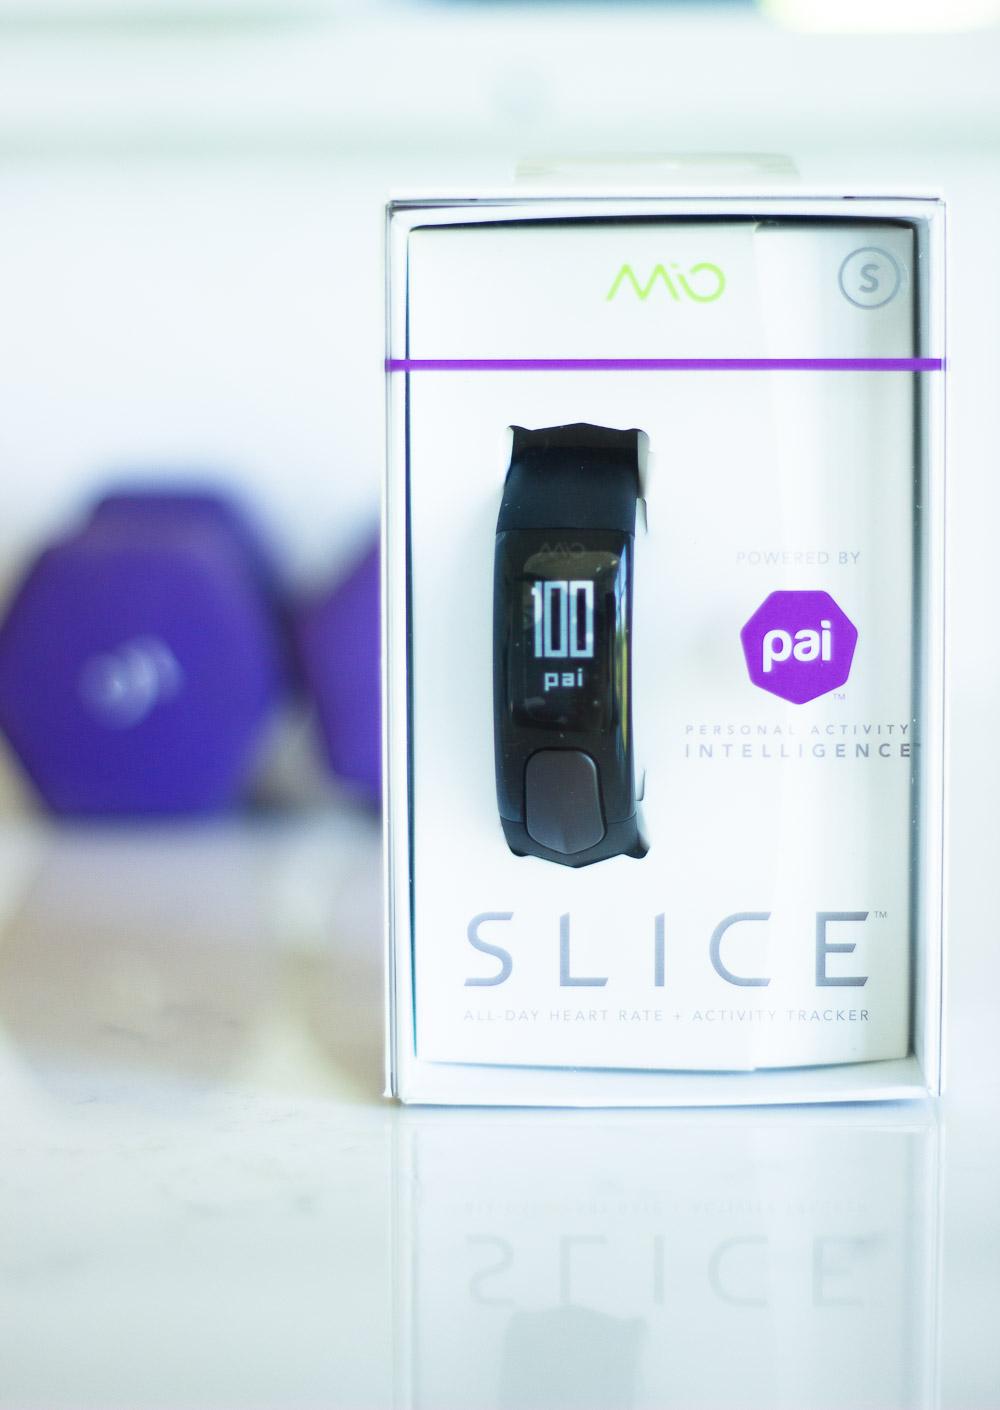 Mio Slice fitness tracker